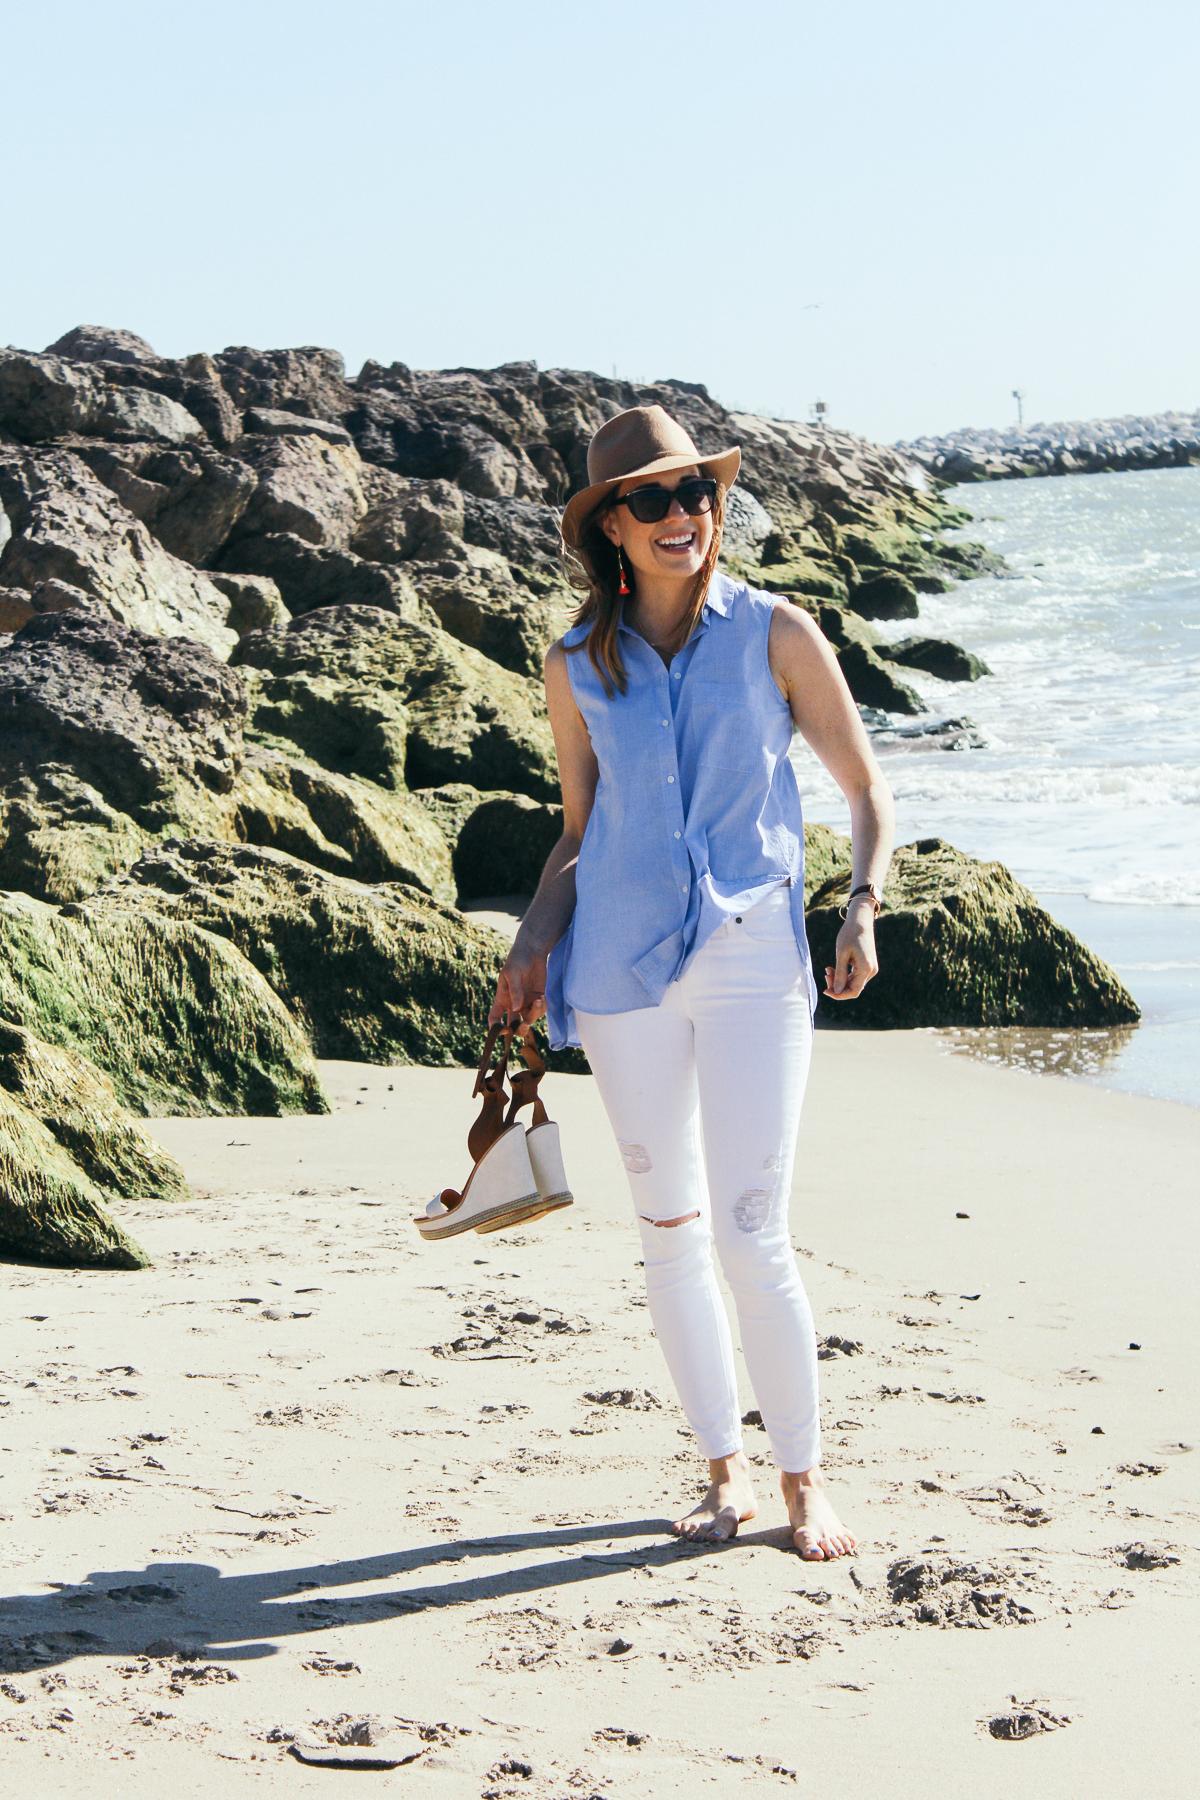 spring style, summer style, resort style, distressed white denim, platform sandals, fringe earrings, nude felt hat